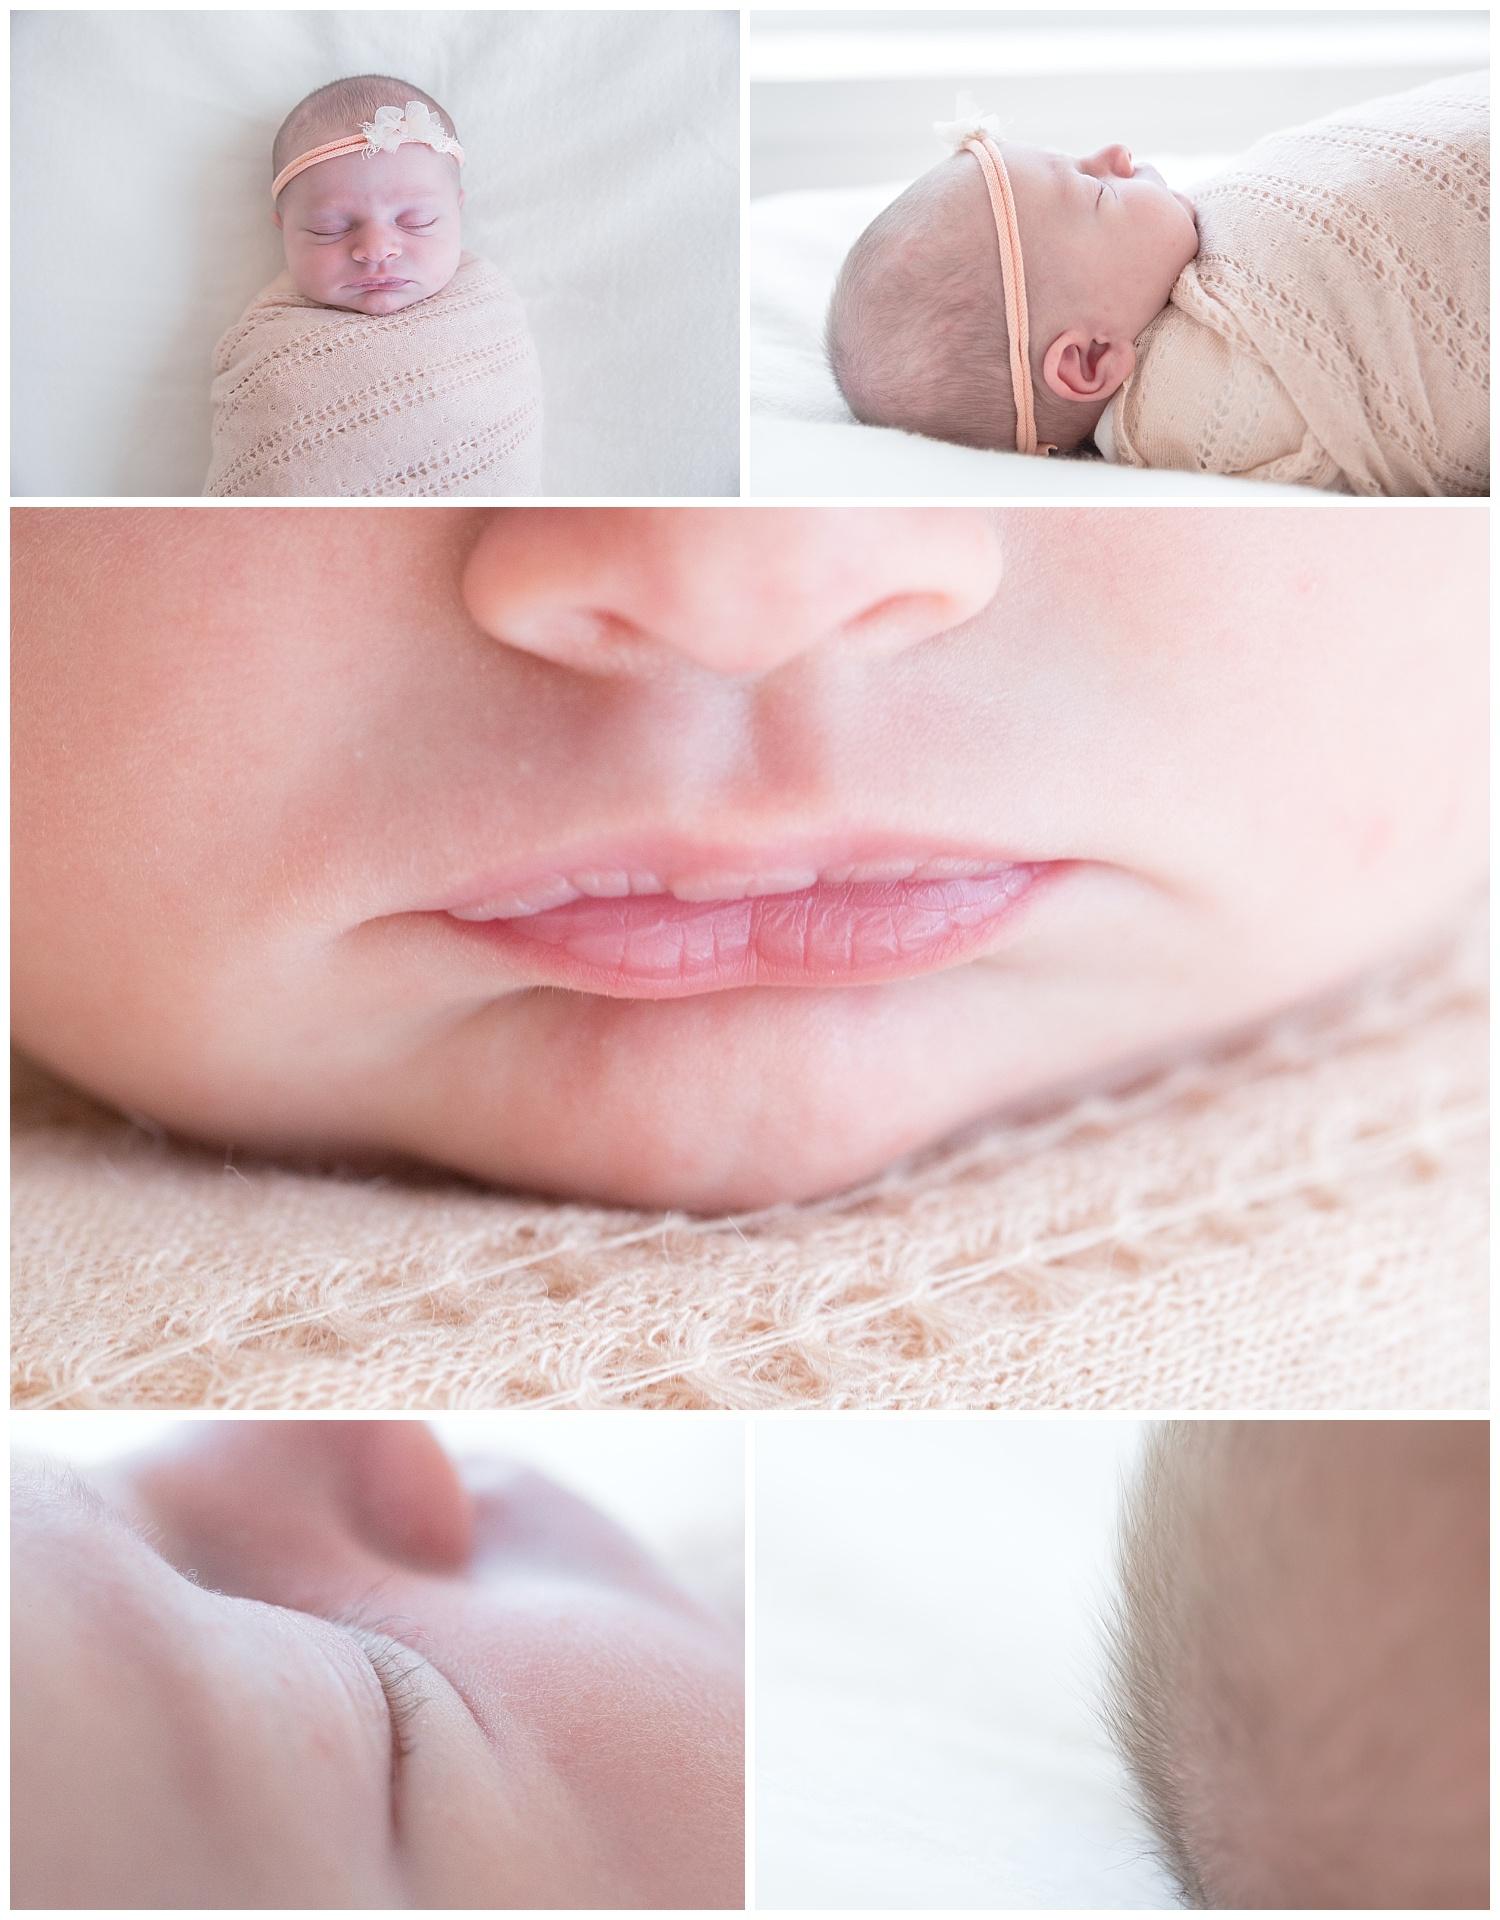 baby photo details lips, eye lashes, fingers, nose in burlington new jersey photo studio